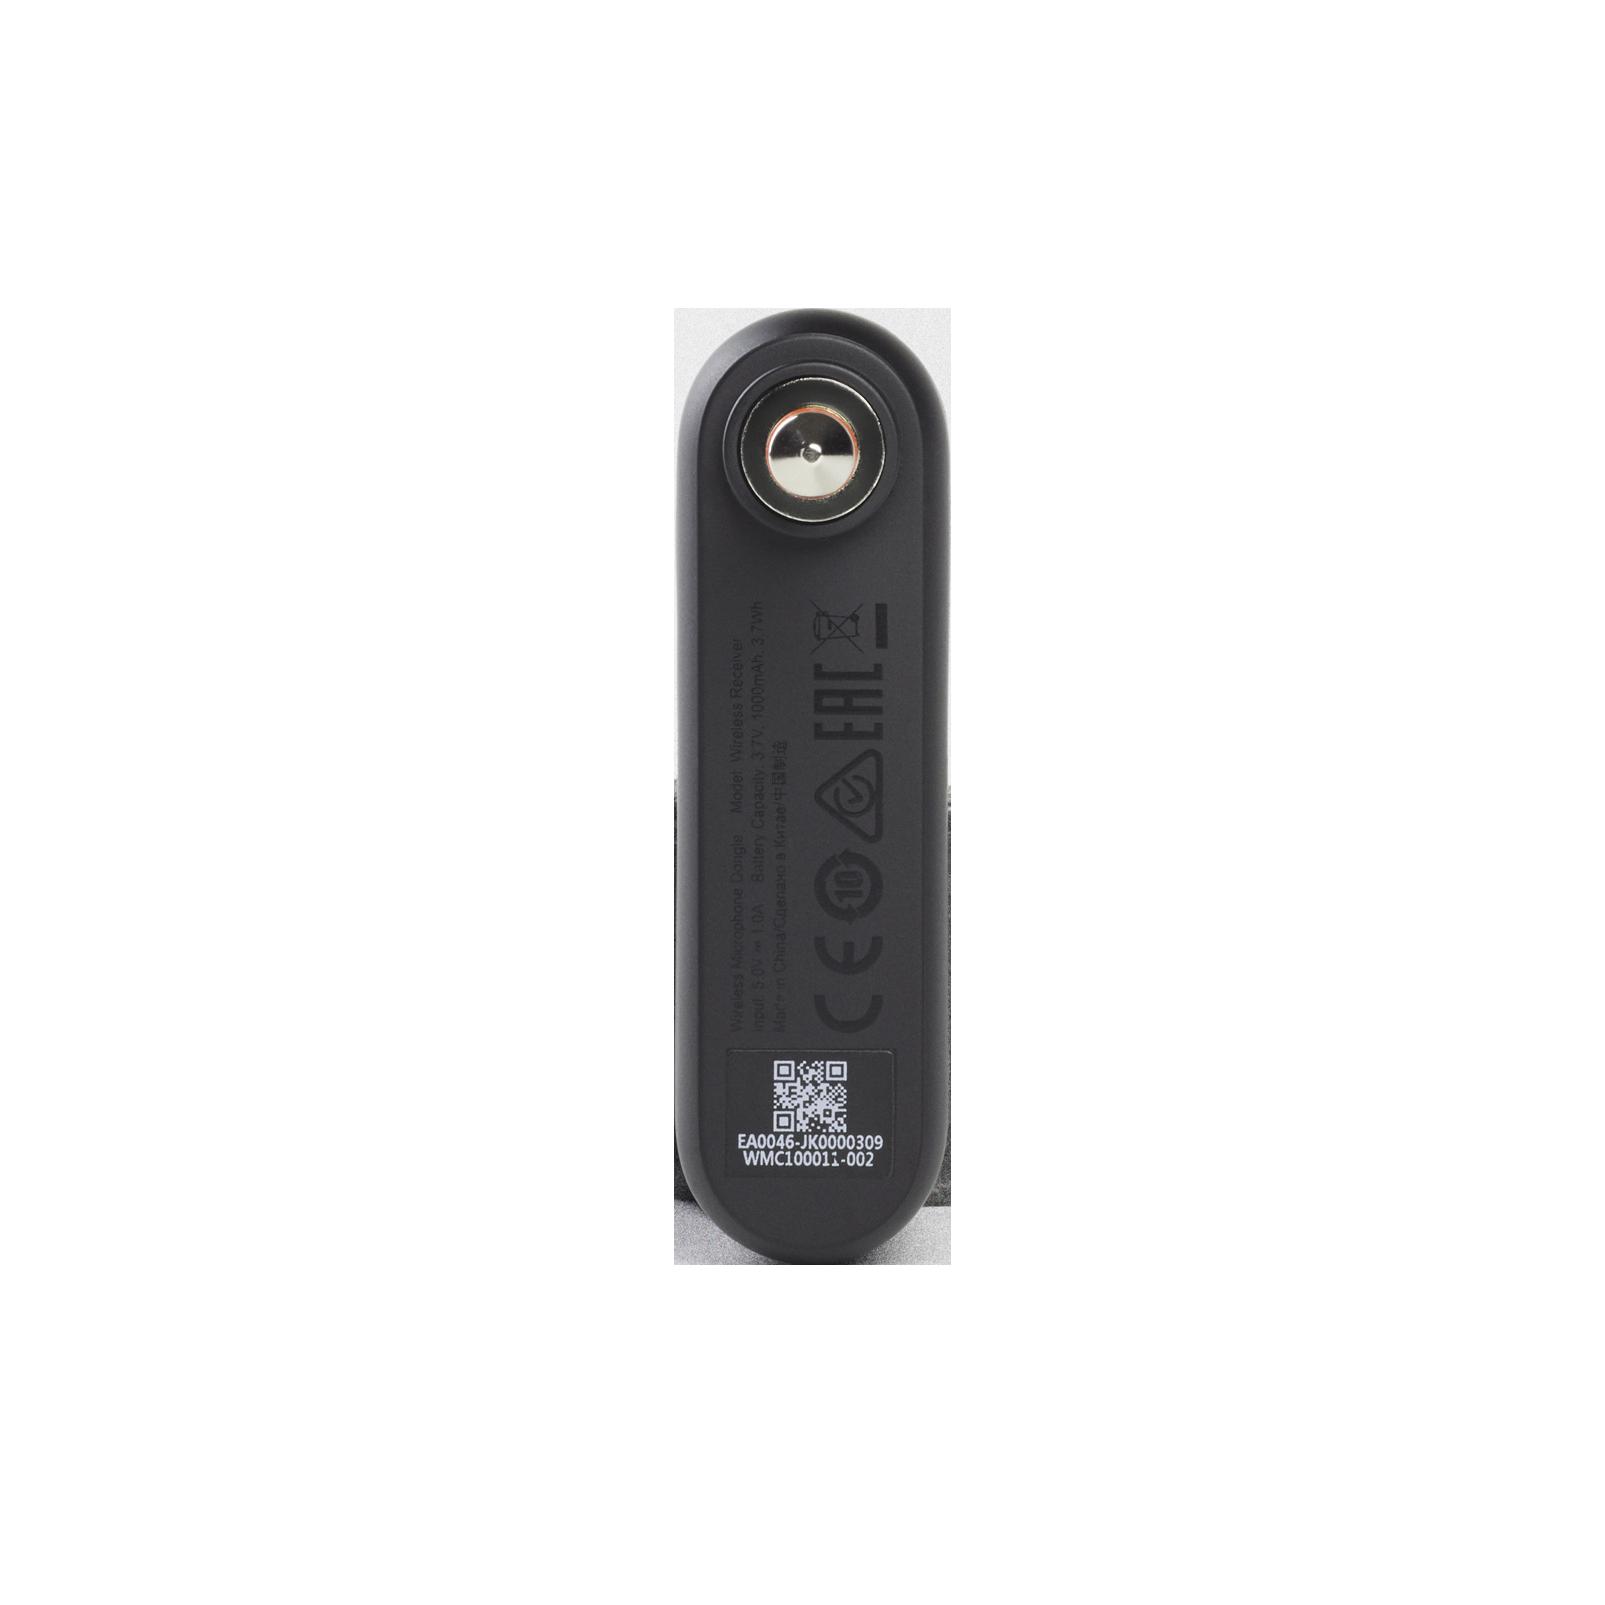 JBL Wireless Microphone Set - Black - Wireless two microphone system - Detailshot 5